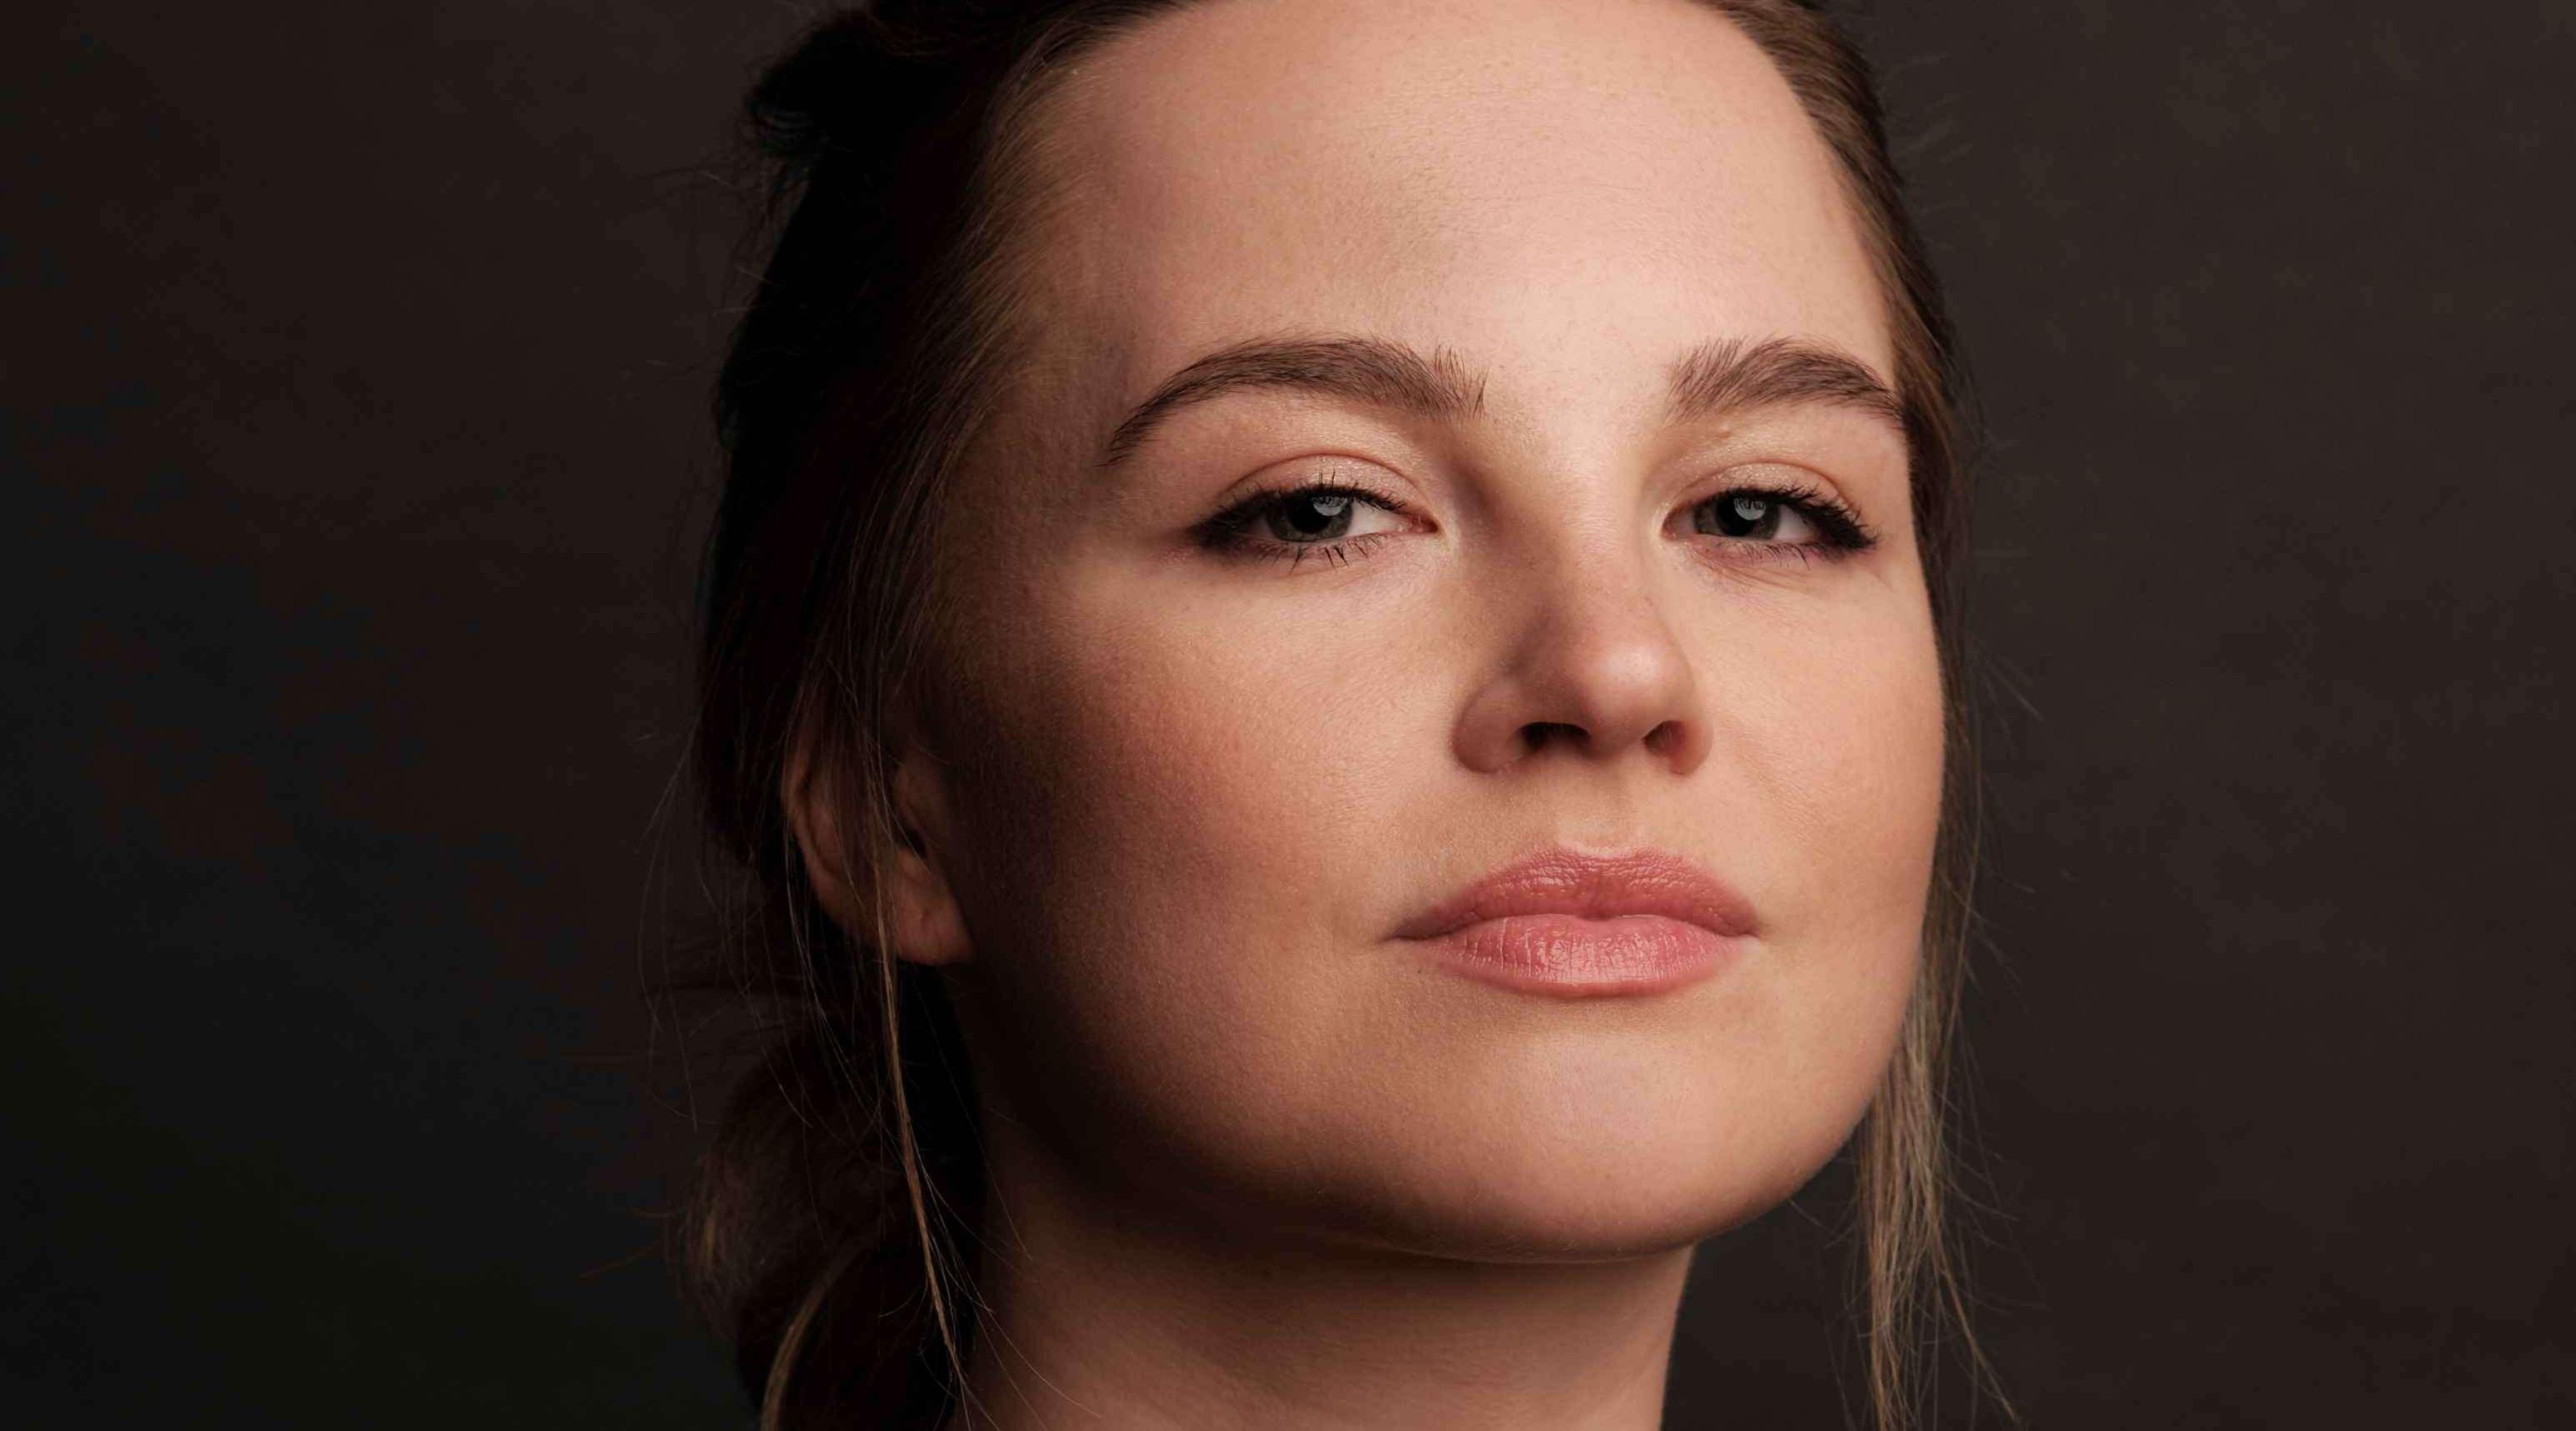 Gabriela Gołaszewska signs with TACT for General Management